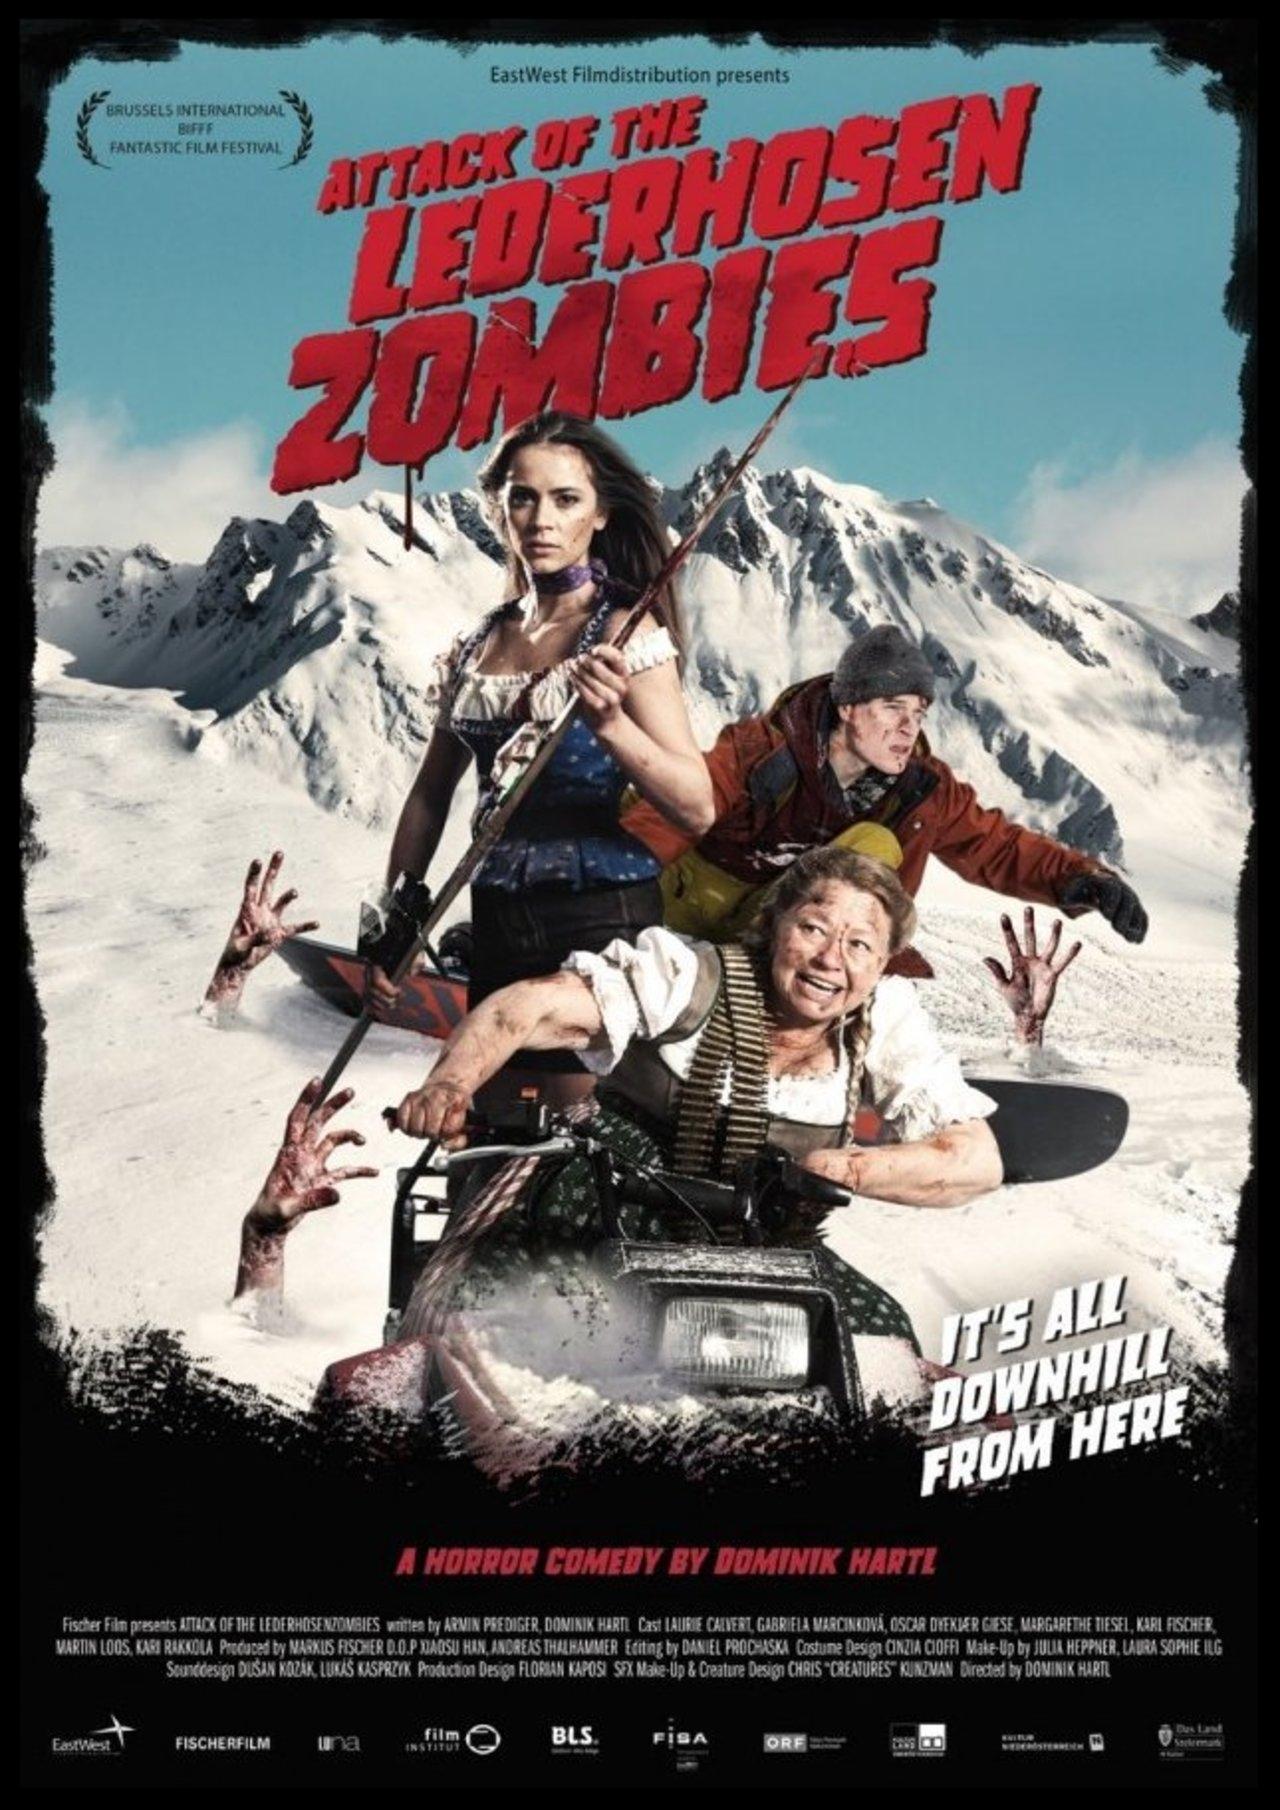 Attack of the Lederhosen Zombies Movie Poster.jpg